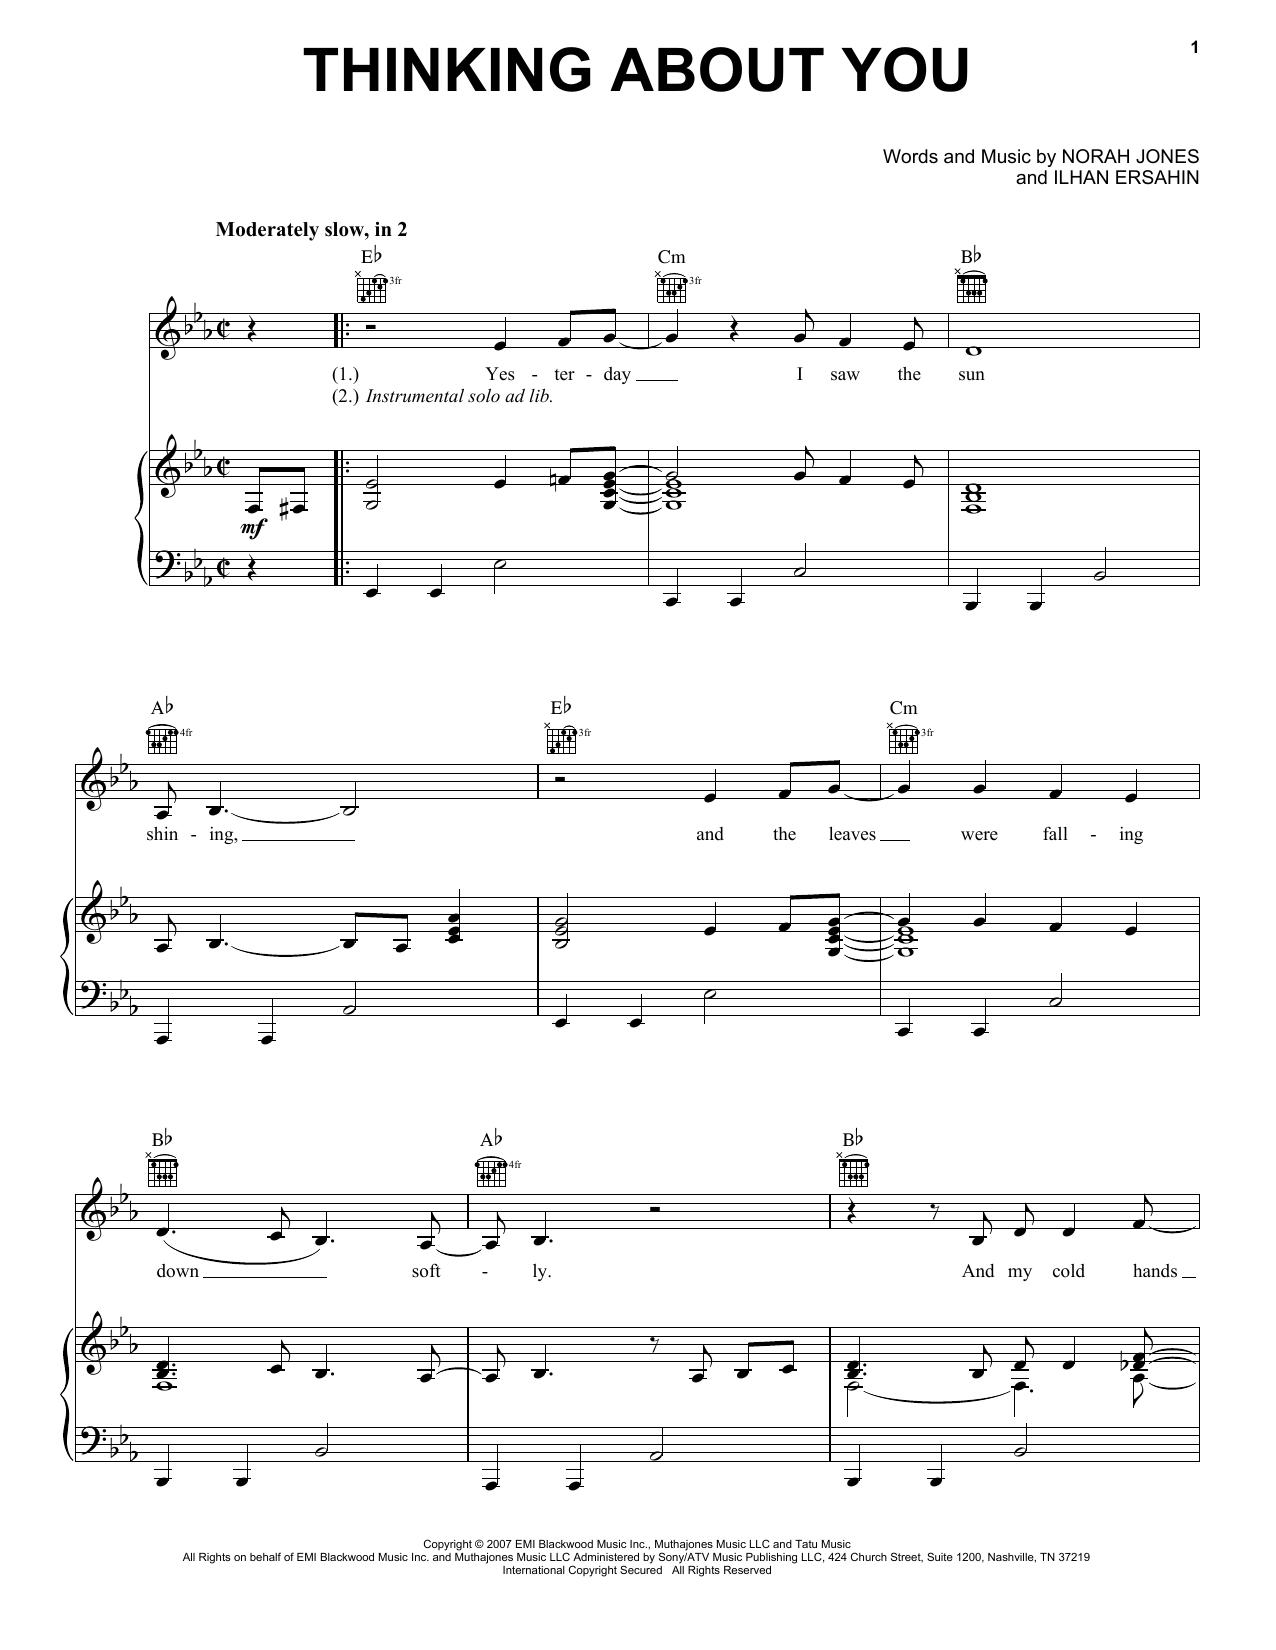 Sheet Music Digital Files To Print Licensed Ilhan Ersahin Digital